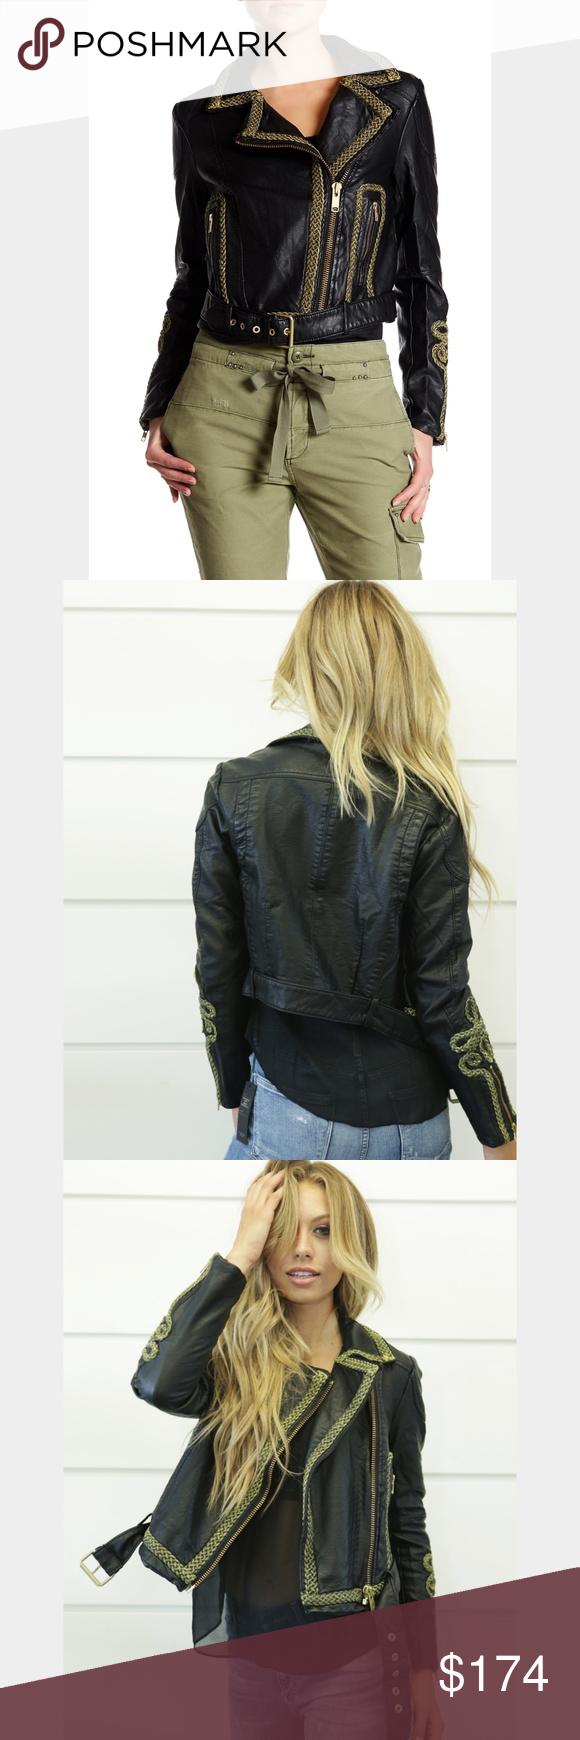 22bbb3b5ad2b7 Free People Bang Bang vegan leather moto jacket Black and gold accents